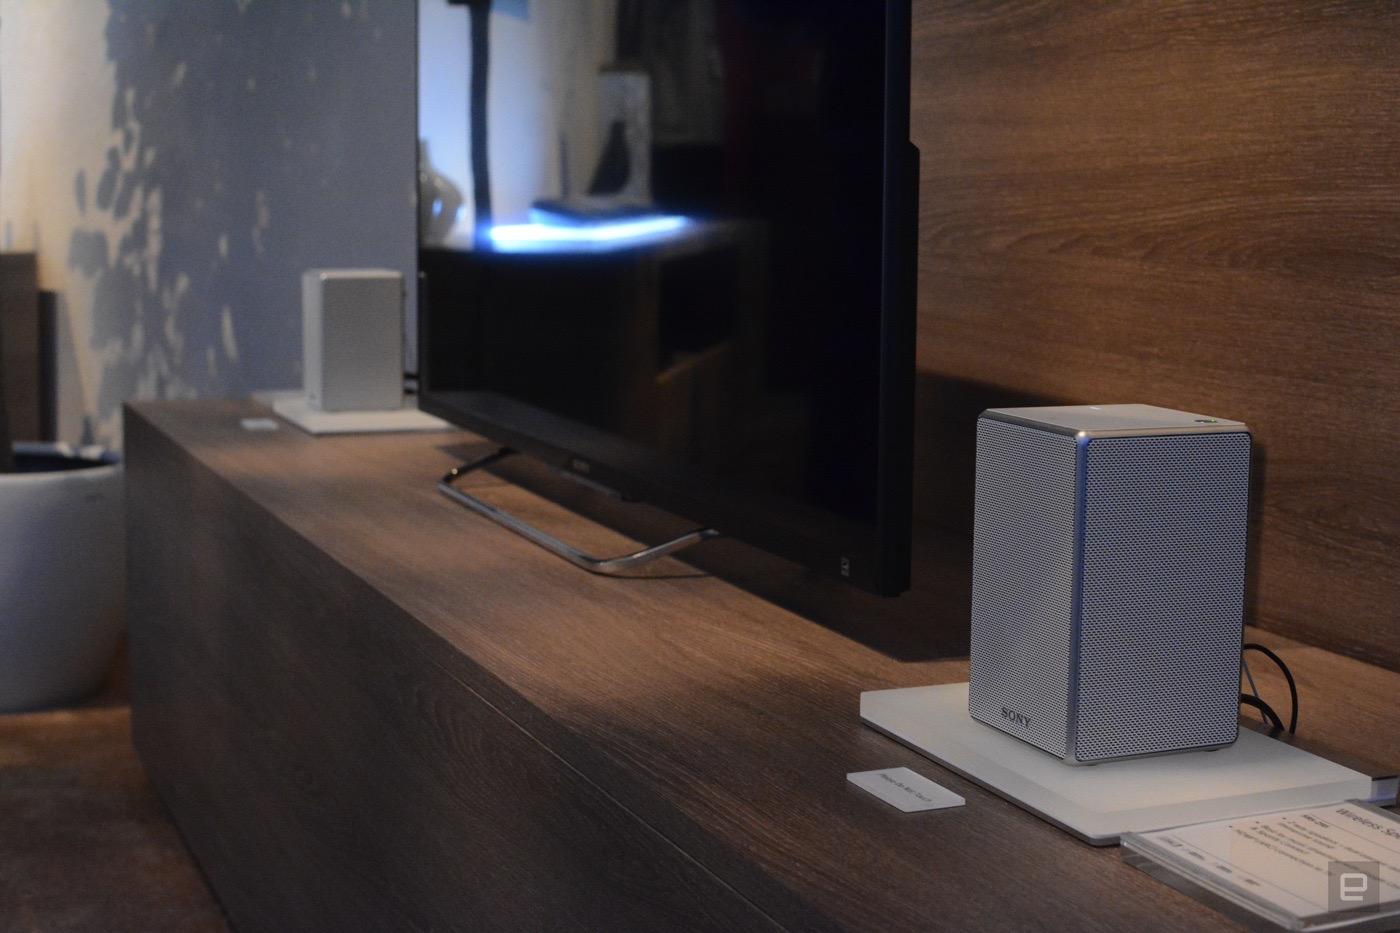 Sony's new multi-room audio gear includes better speaker options